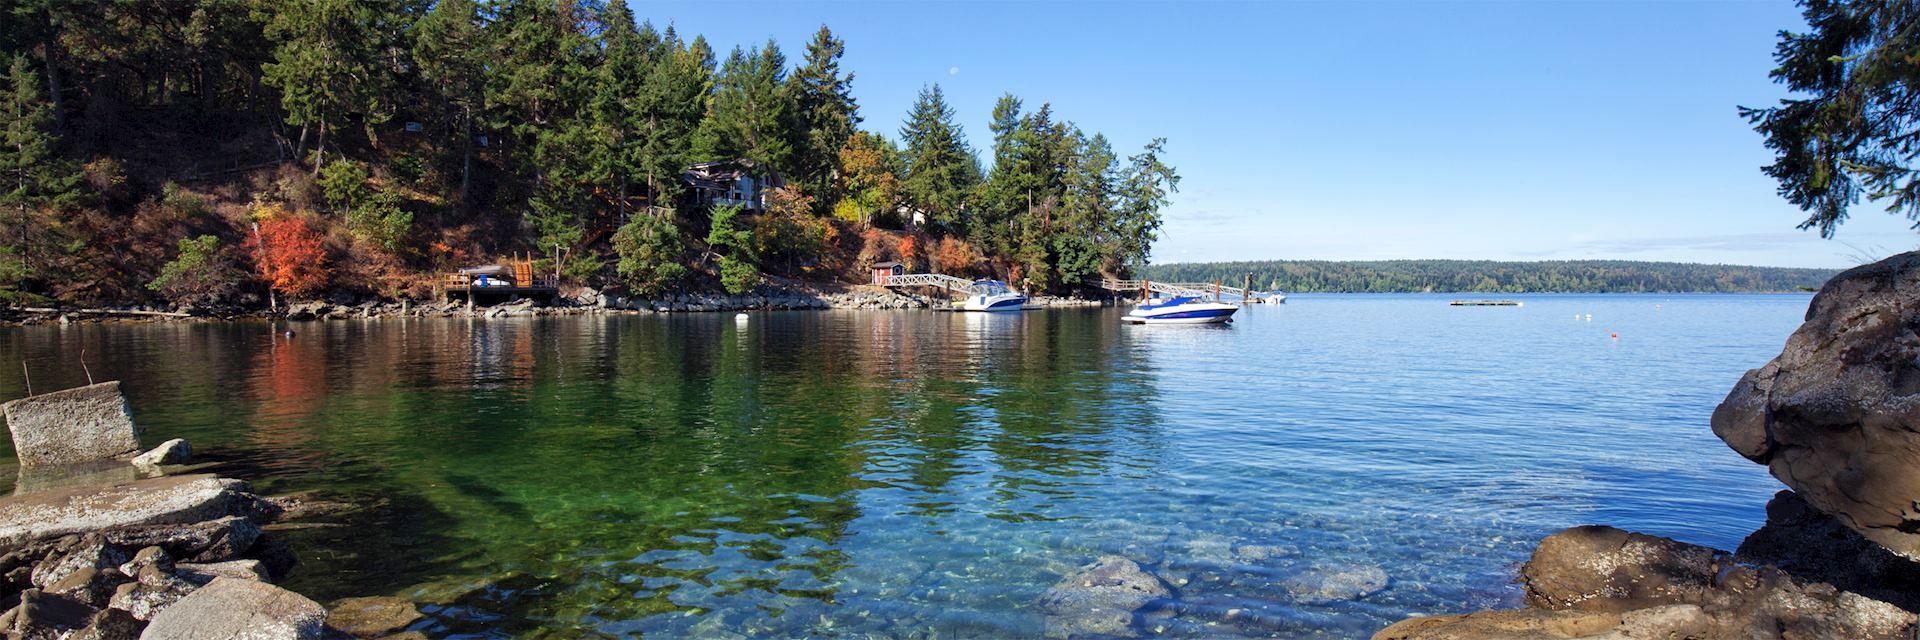 Salt Spring Island, British Columbia